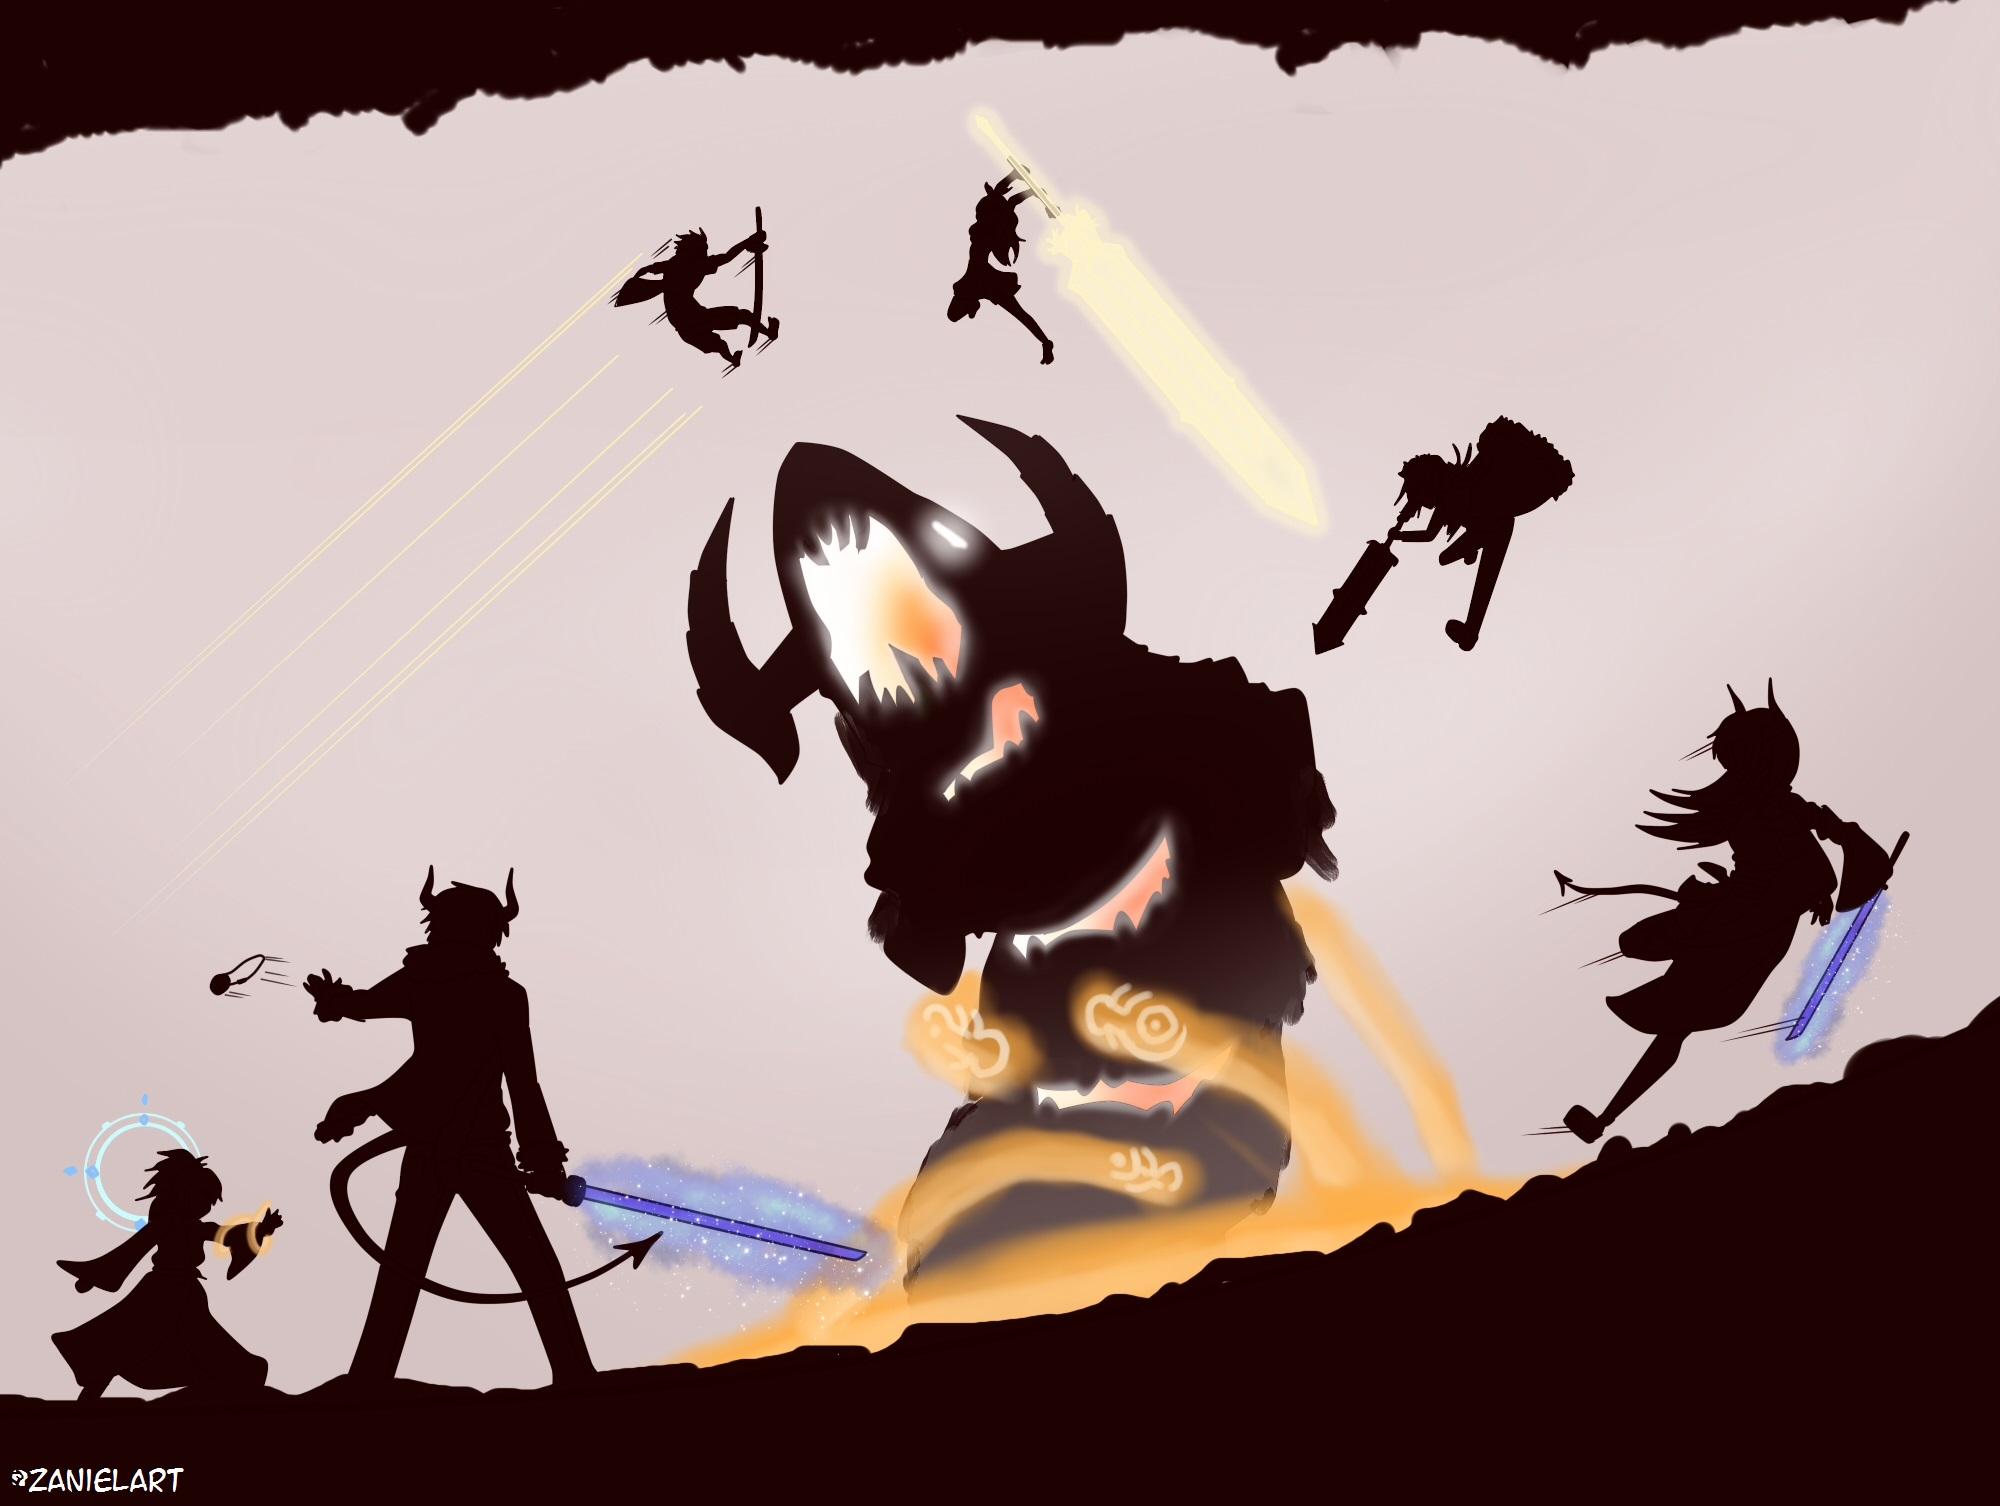 http://nxcache.nexon.net/cms/2019/Q2/1555/vellum-fight_-zanny-zee.jpg